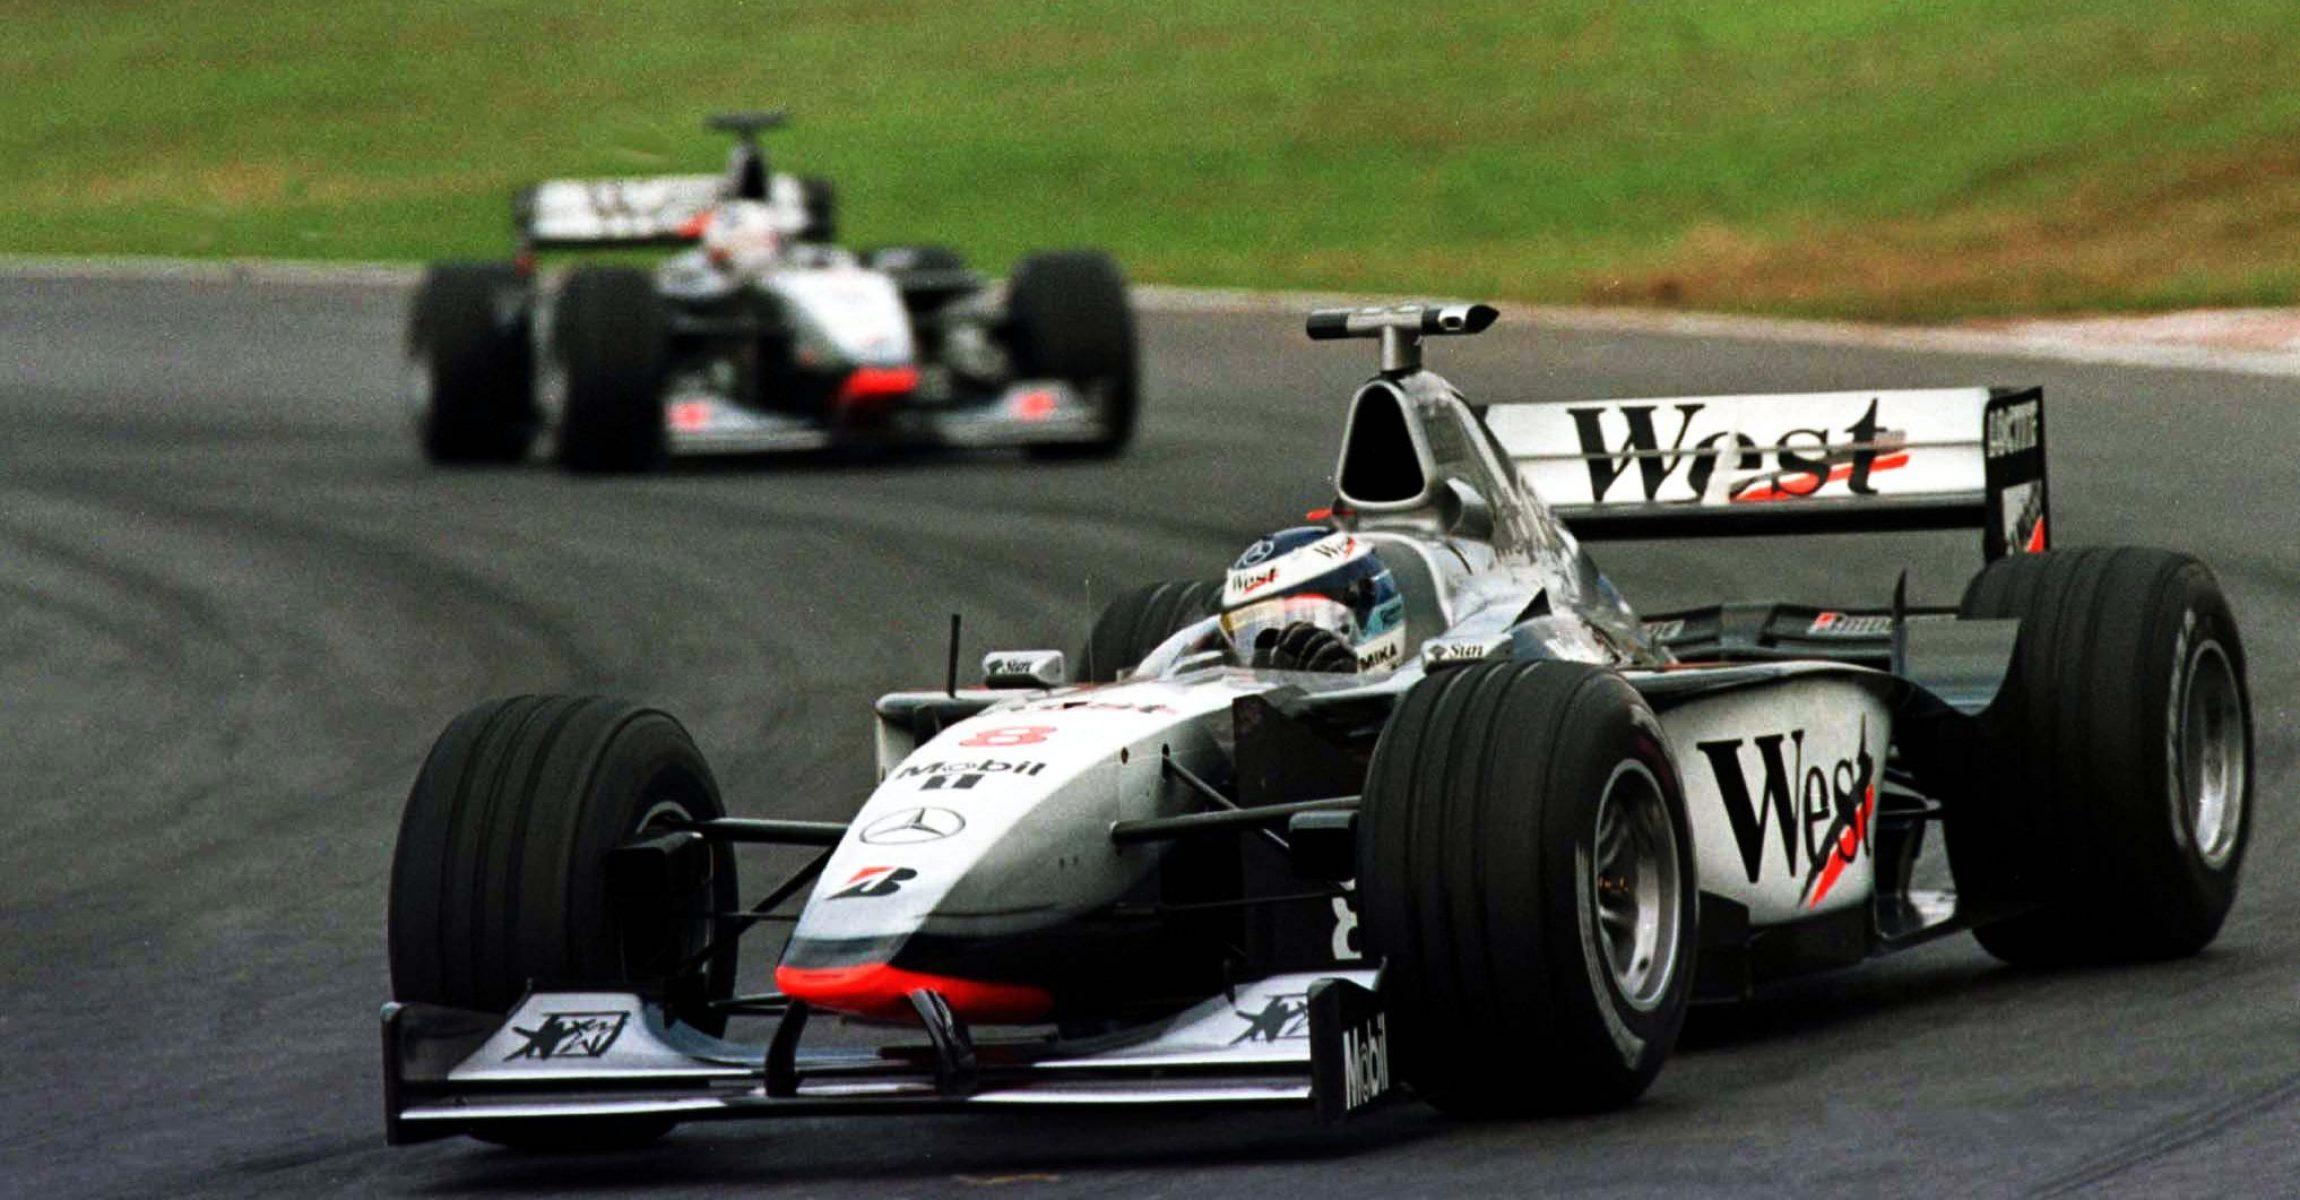 Mika Häkkinen leads in Interlagos followed by his McLaren's teammate David Coulthard in 1998, Brazilian Grand Prix